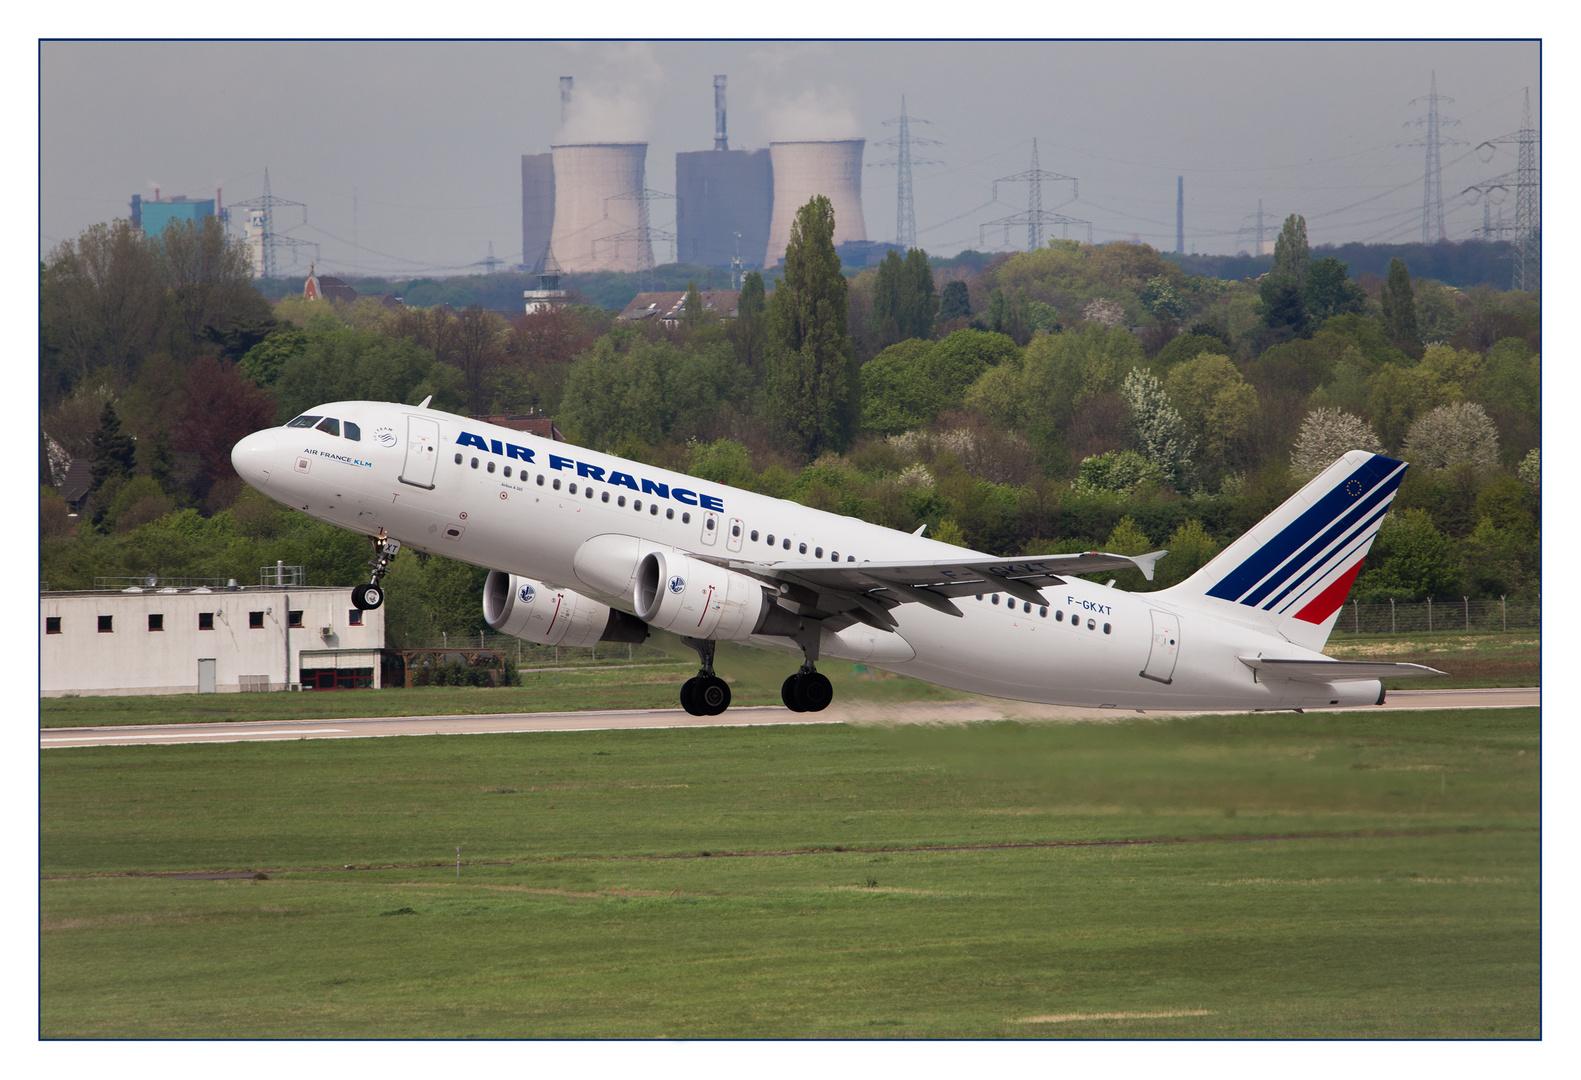 Air France in DUS